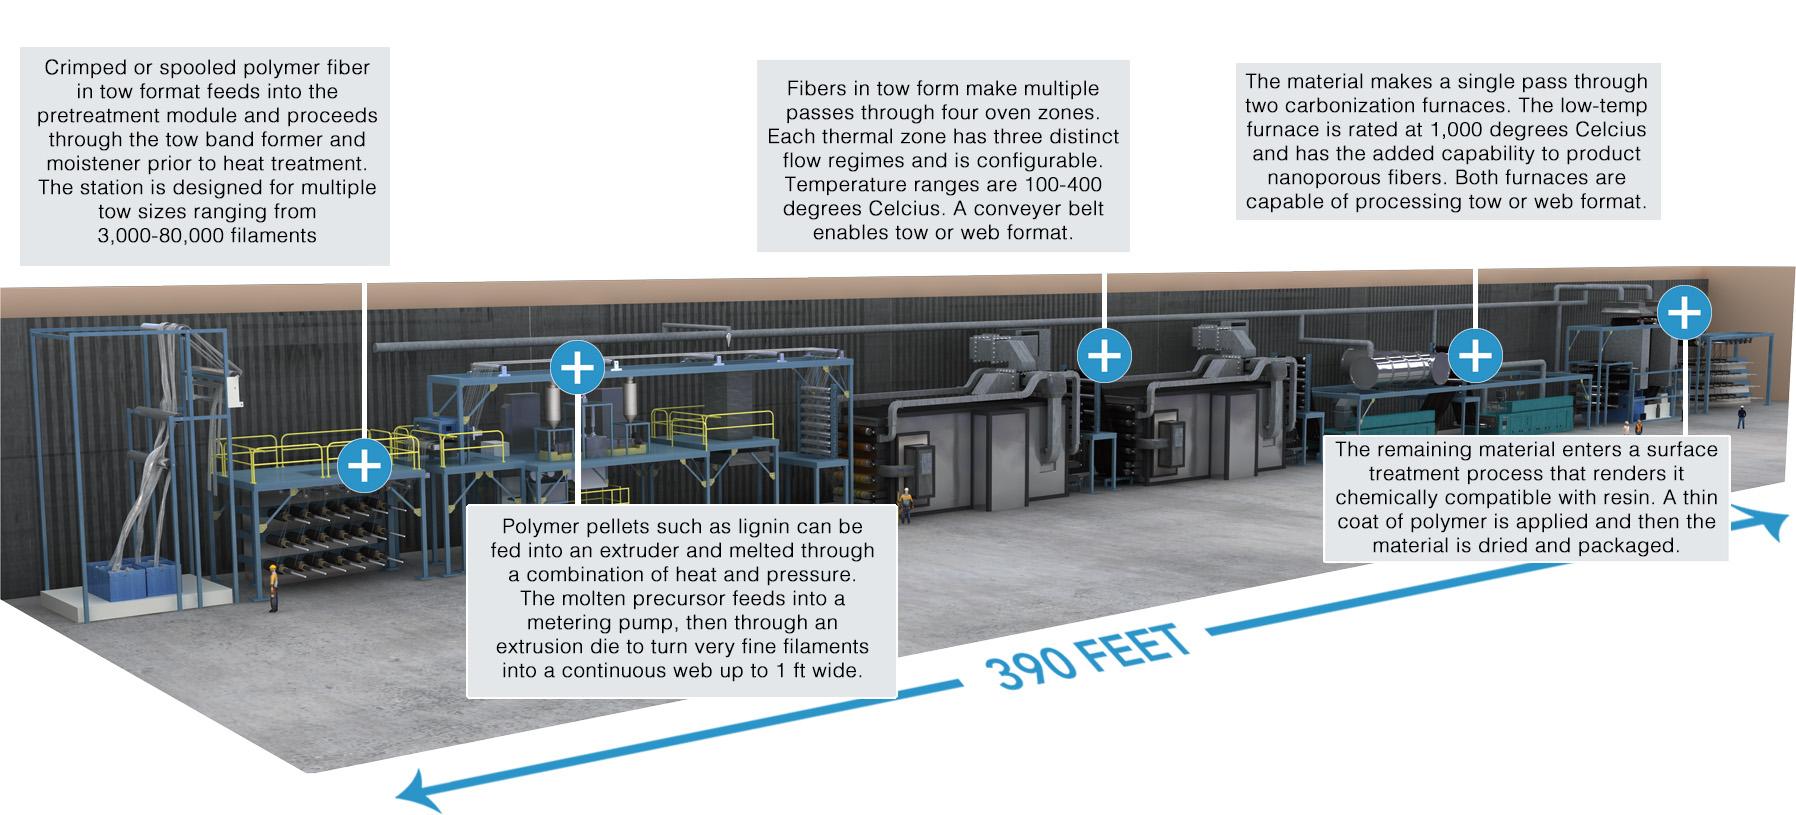 carbon fiber technology facility